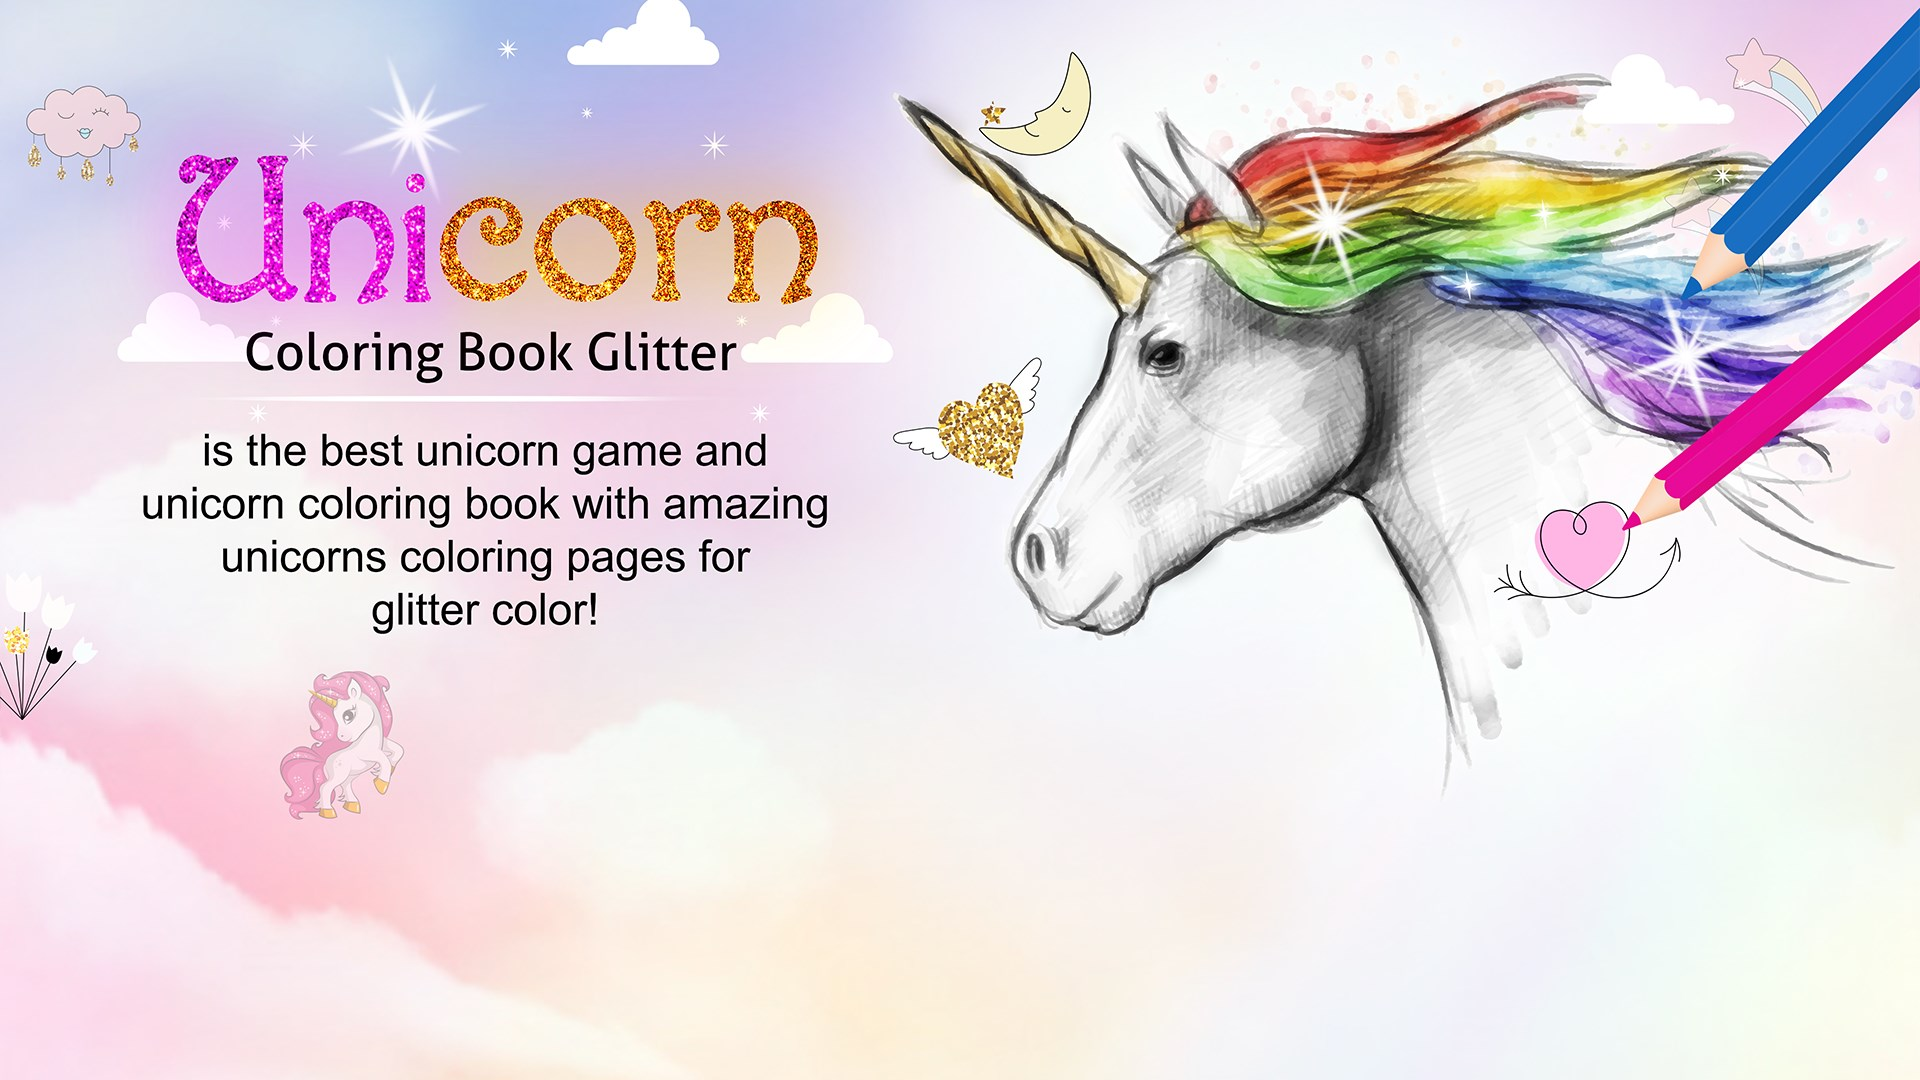 Get Unicorn Coloring Book Glitter - Microsoft Store en-TK